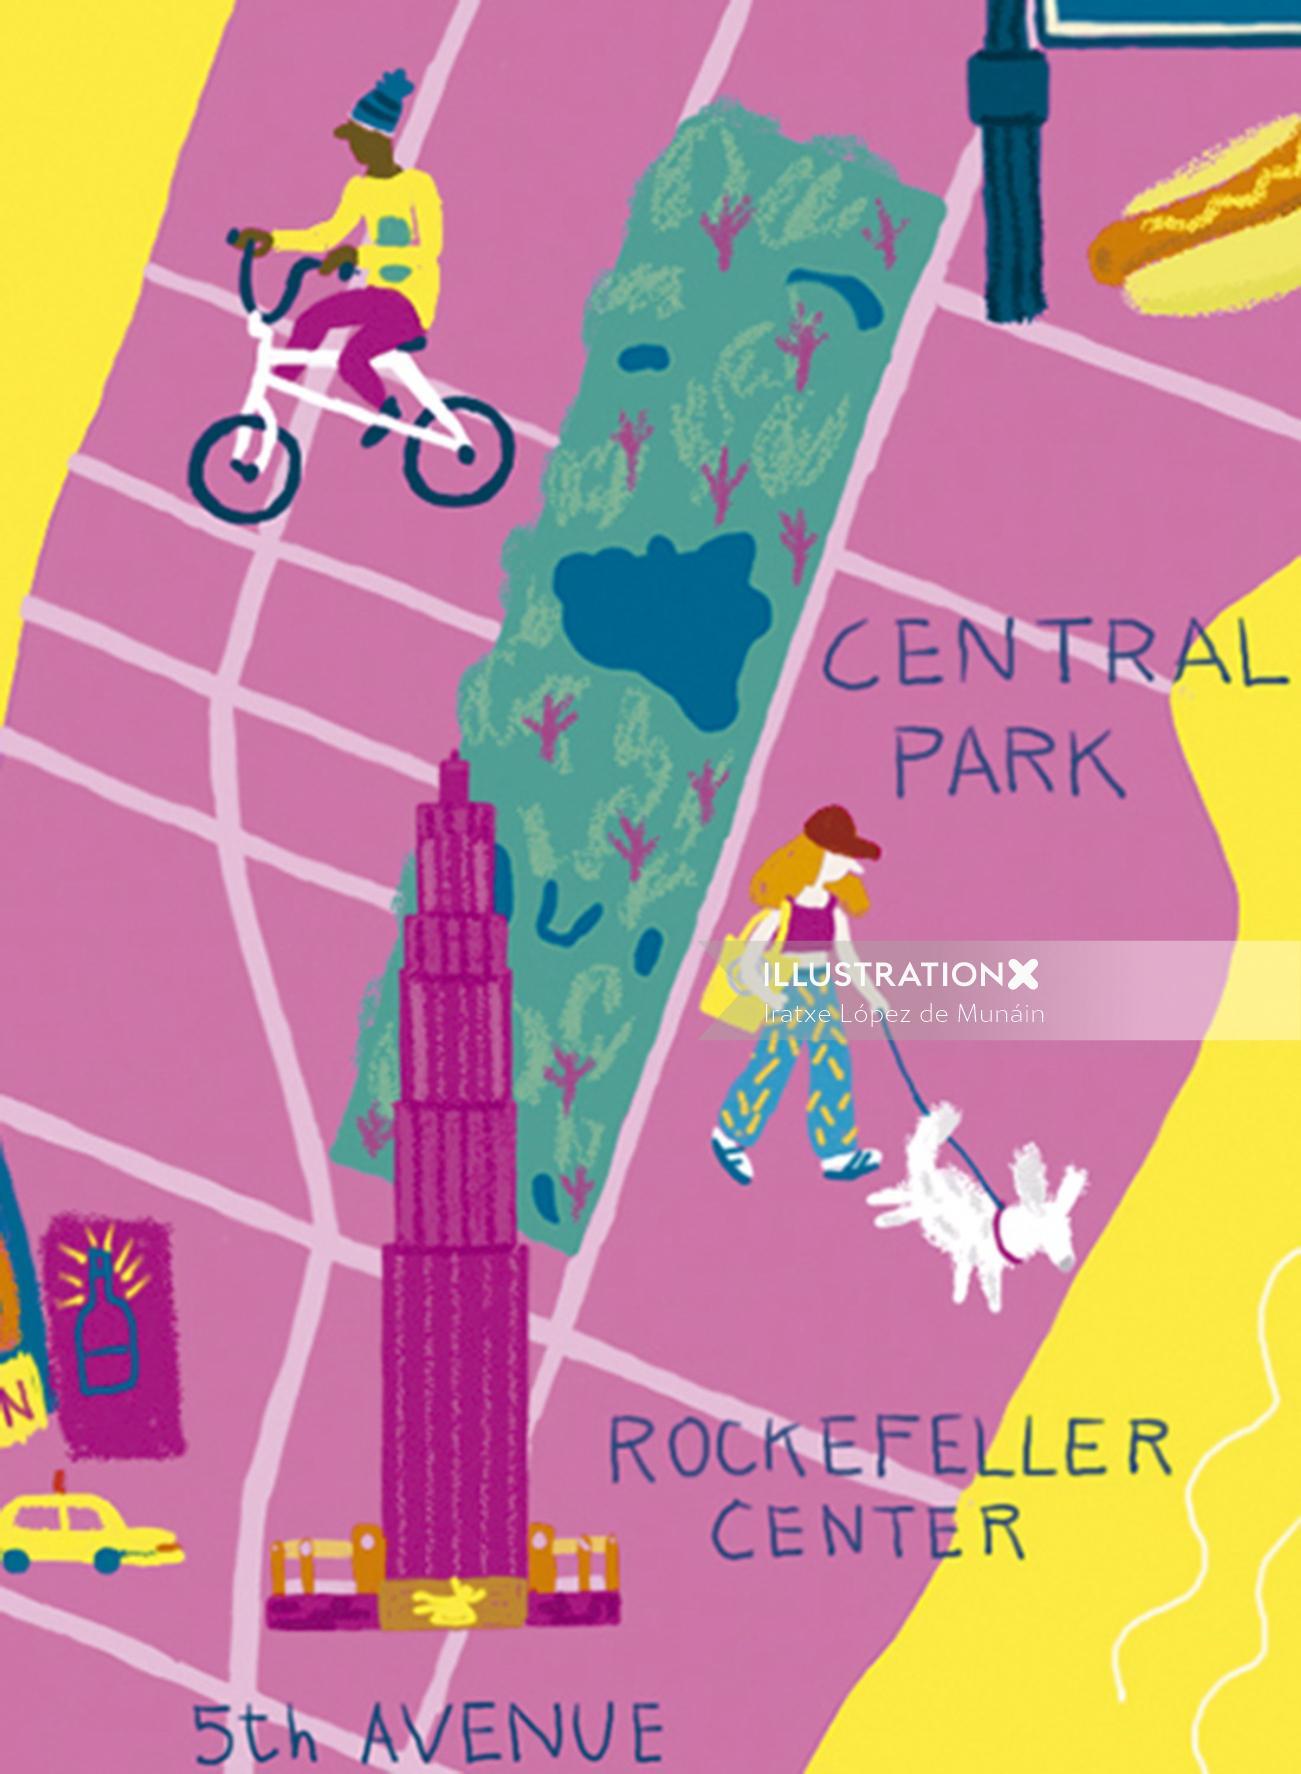 New York map design by Iratxe López de Munáin